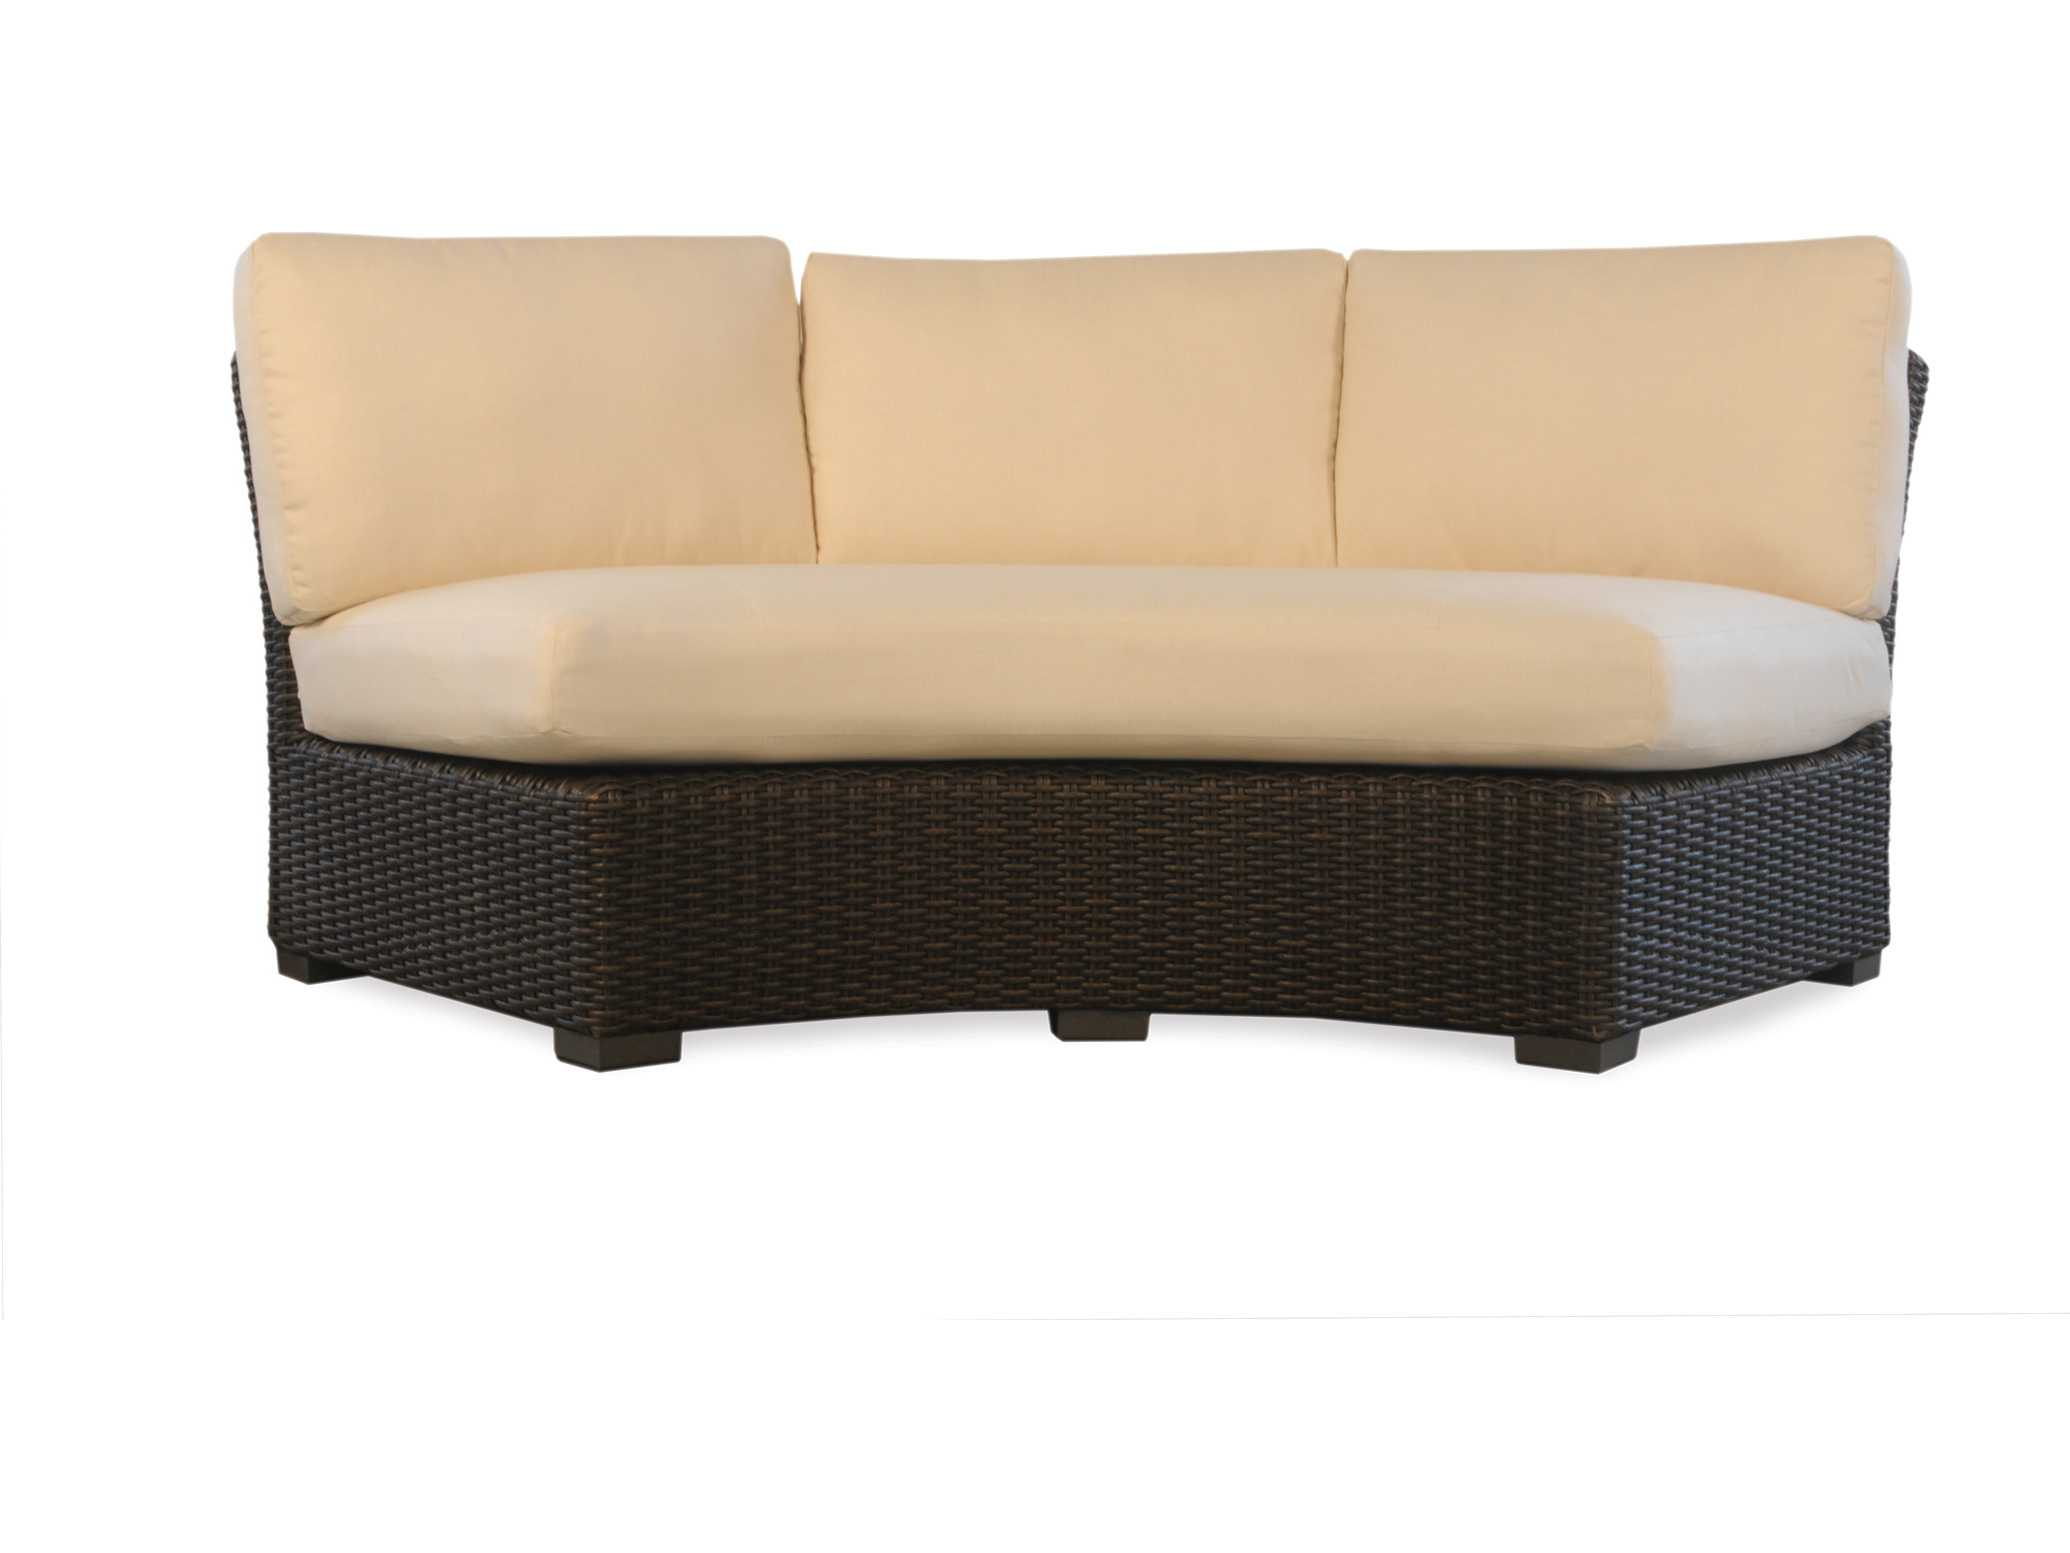 Lloyd Flanders Mesa Wicker Curved Sofa Sectional